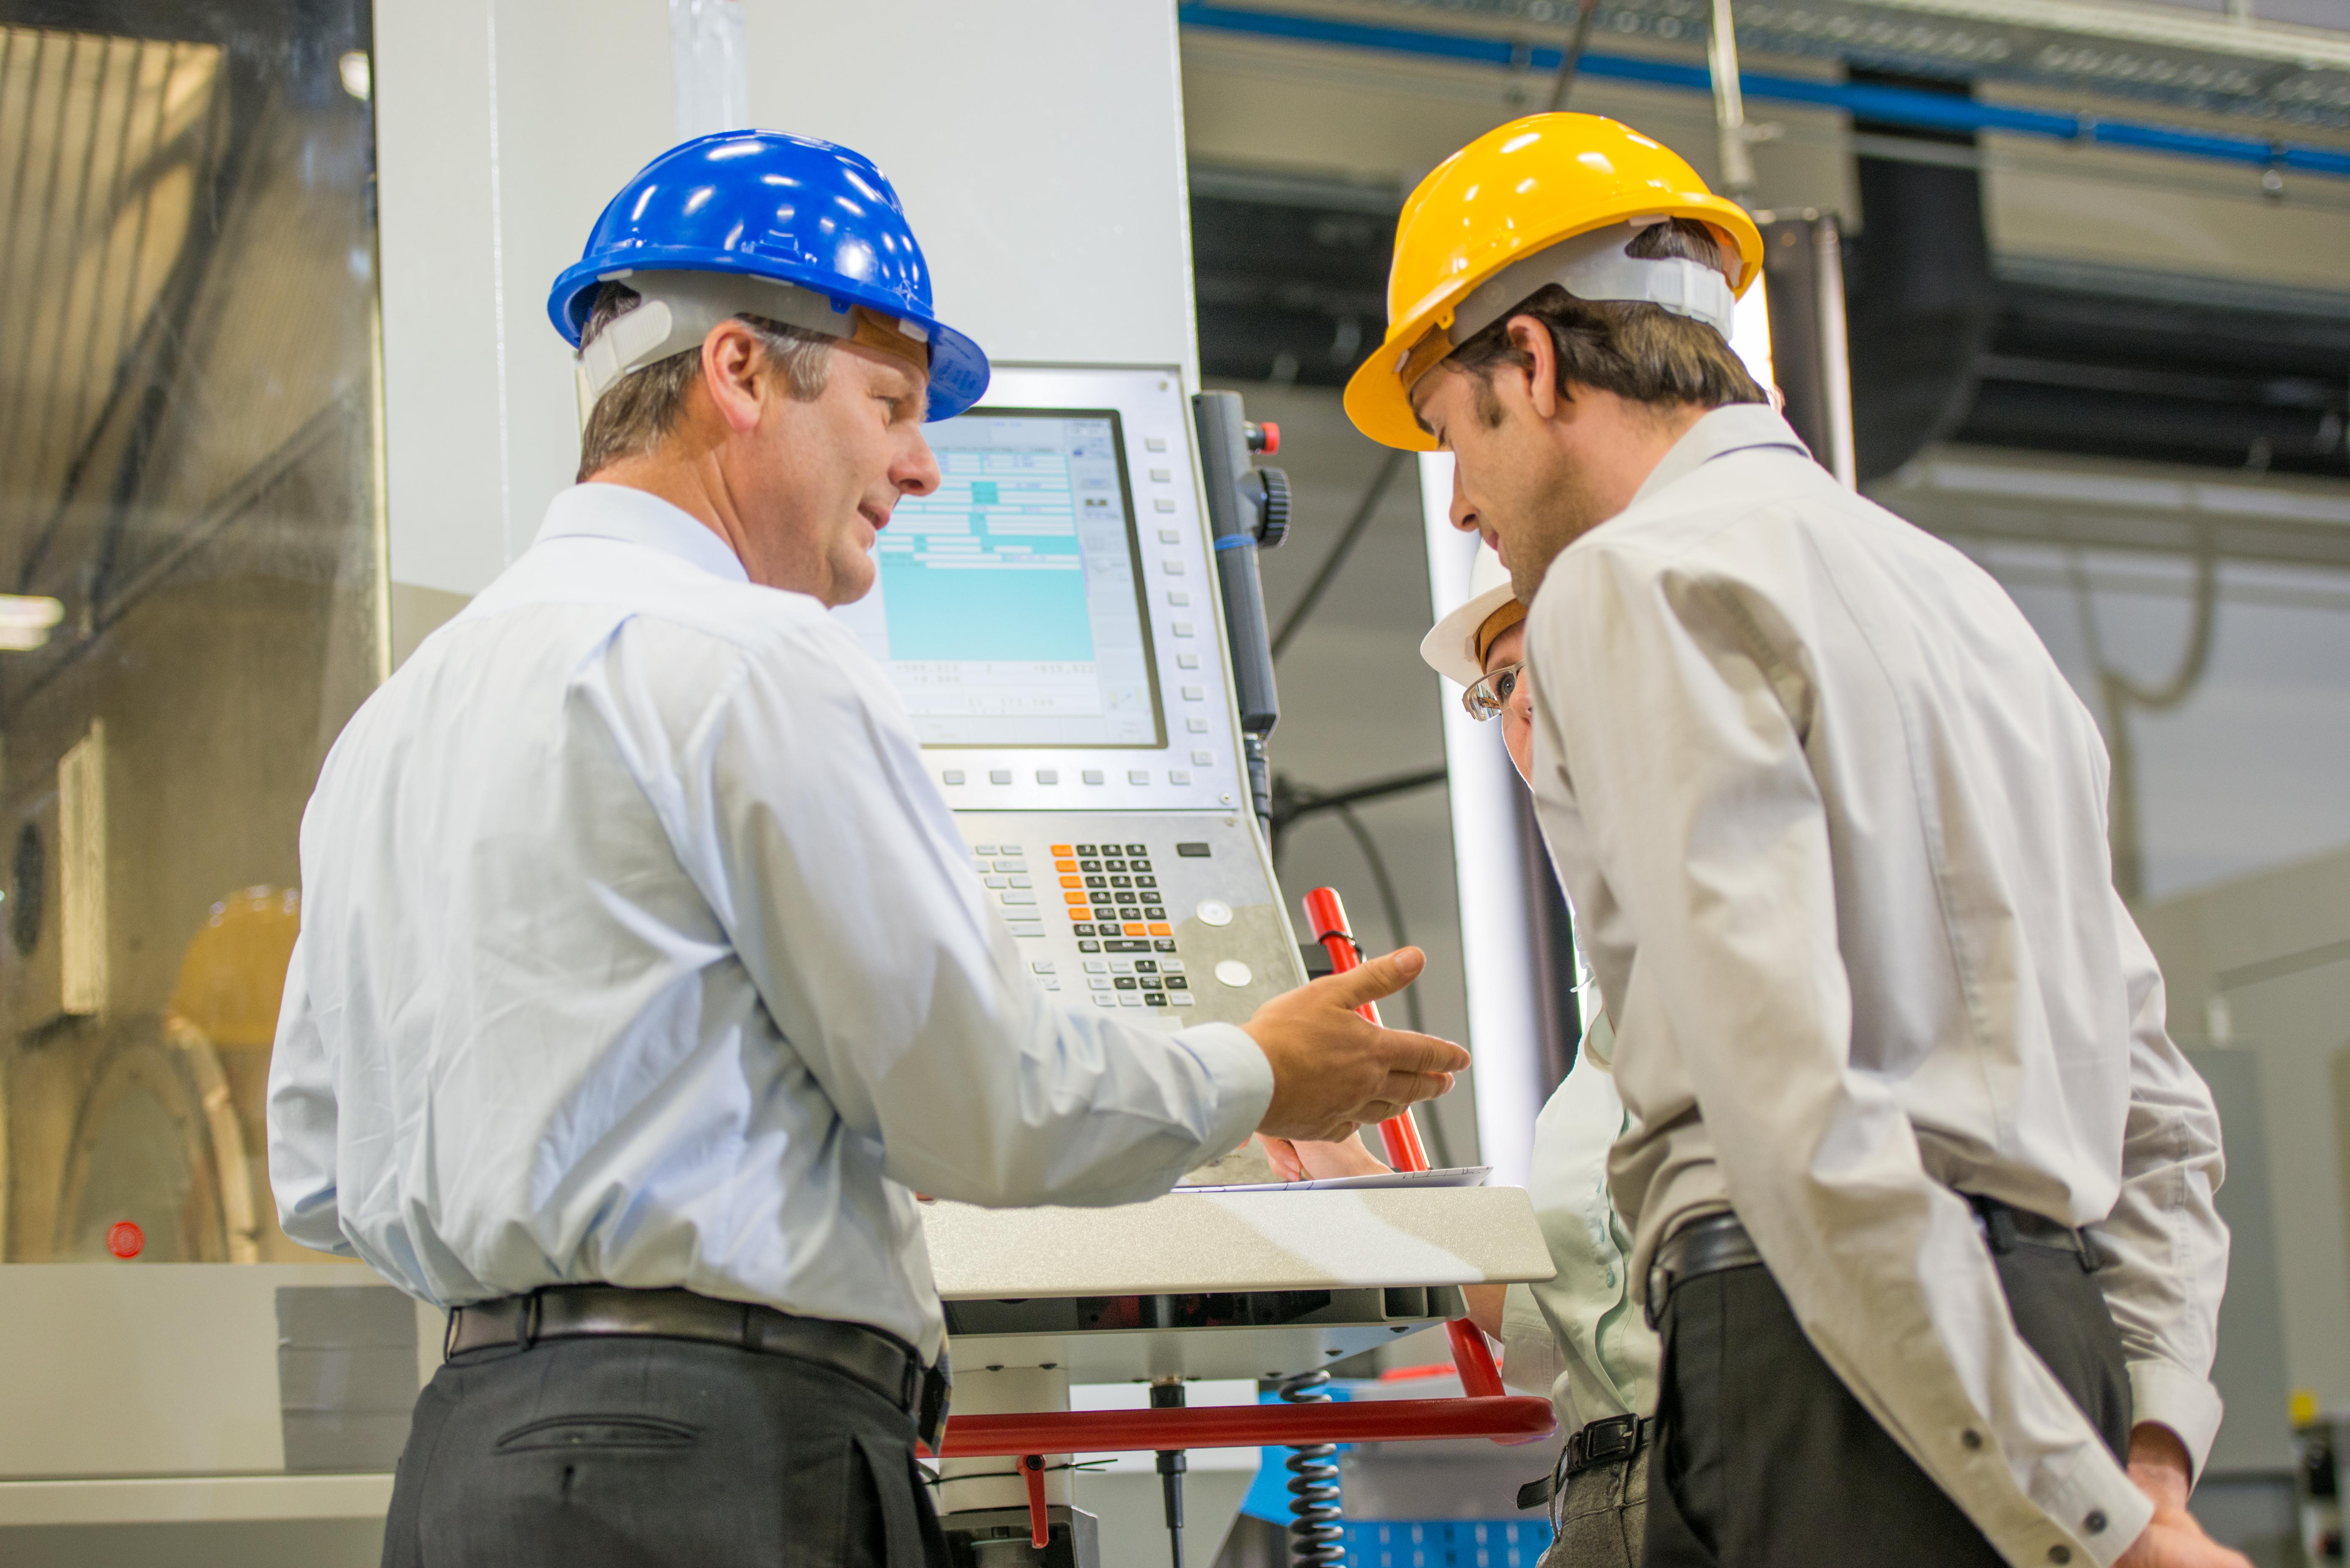 Engineers Programming A CNC Machine